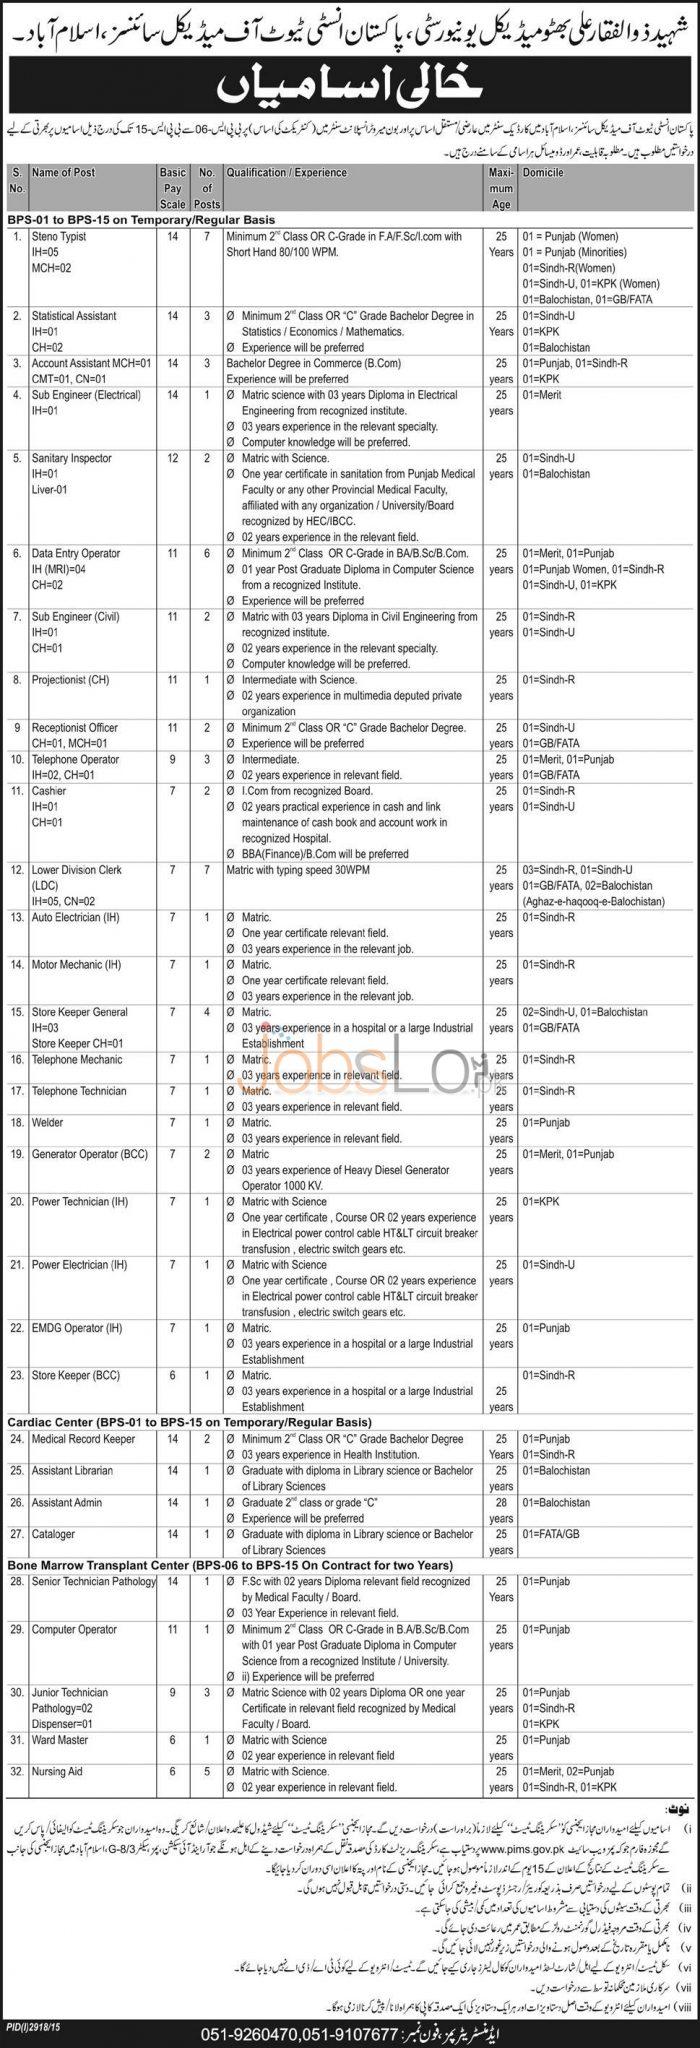 www.pims.gov.pk Jobs 10 December 2015 Download Application